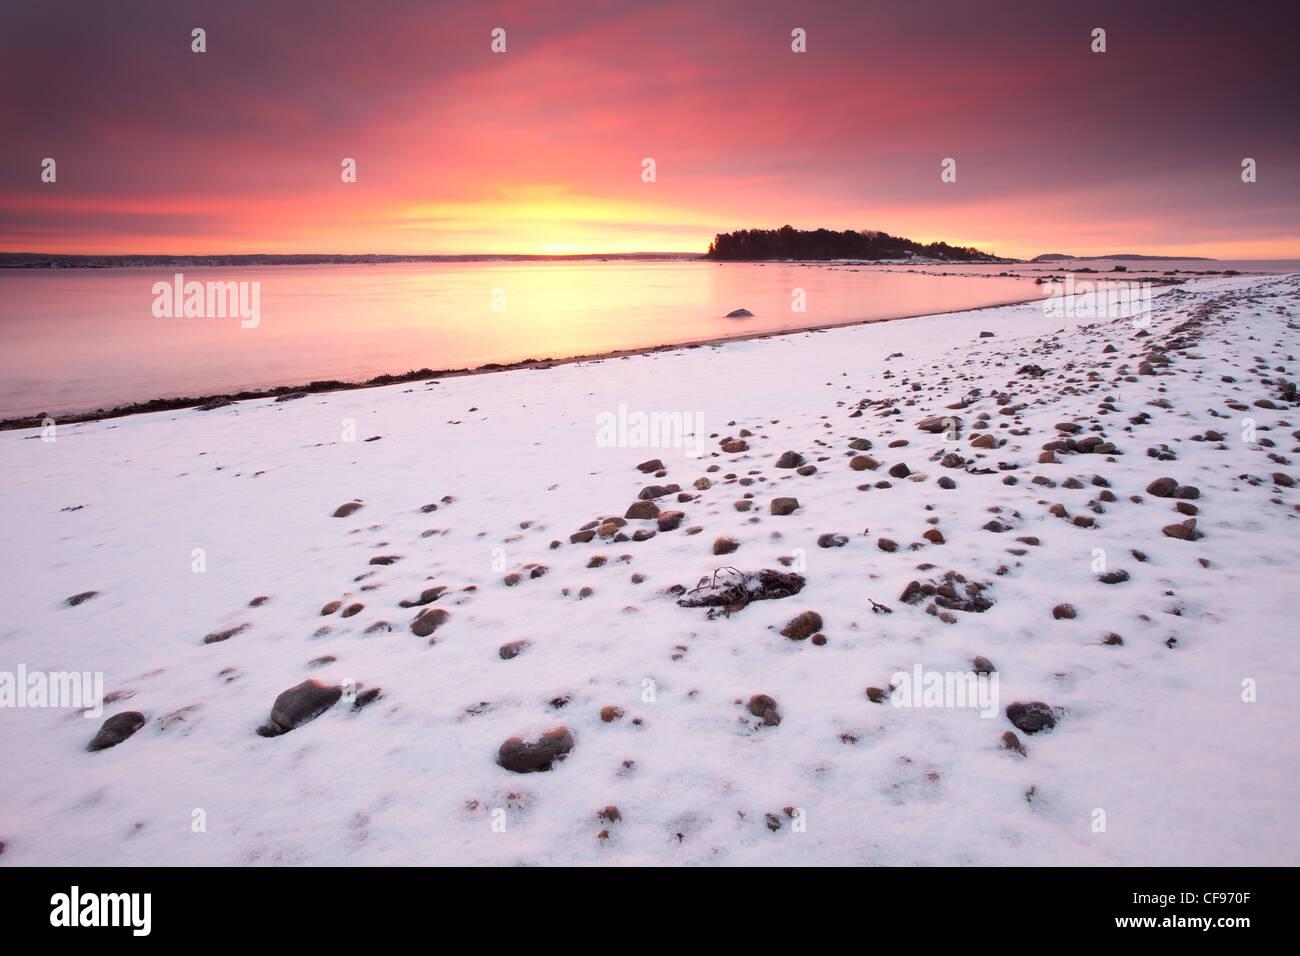 Schönen Wintermorgen am Oslofjord, Larkollen in Rygge, Østfold fylke, Norwegen. Stockbild